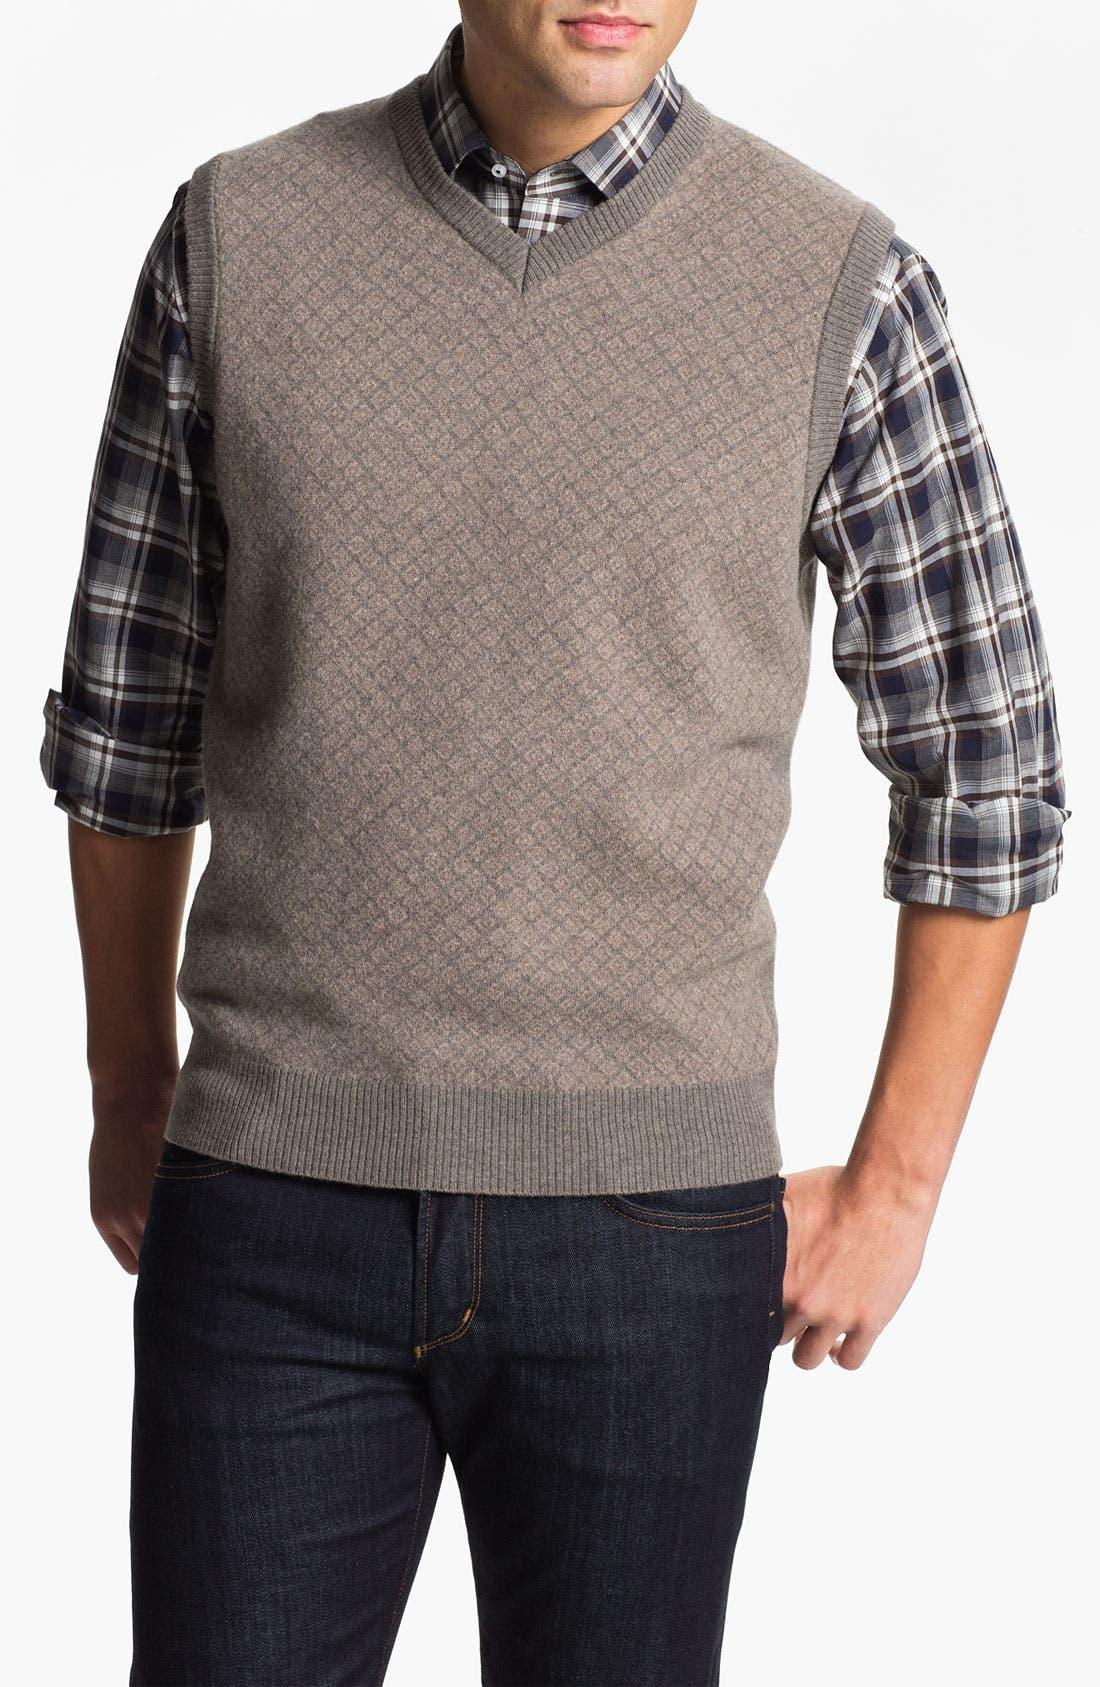 FRANCO DANTI V-Neck Wool Sweater Vest, Main, color, 200